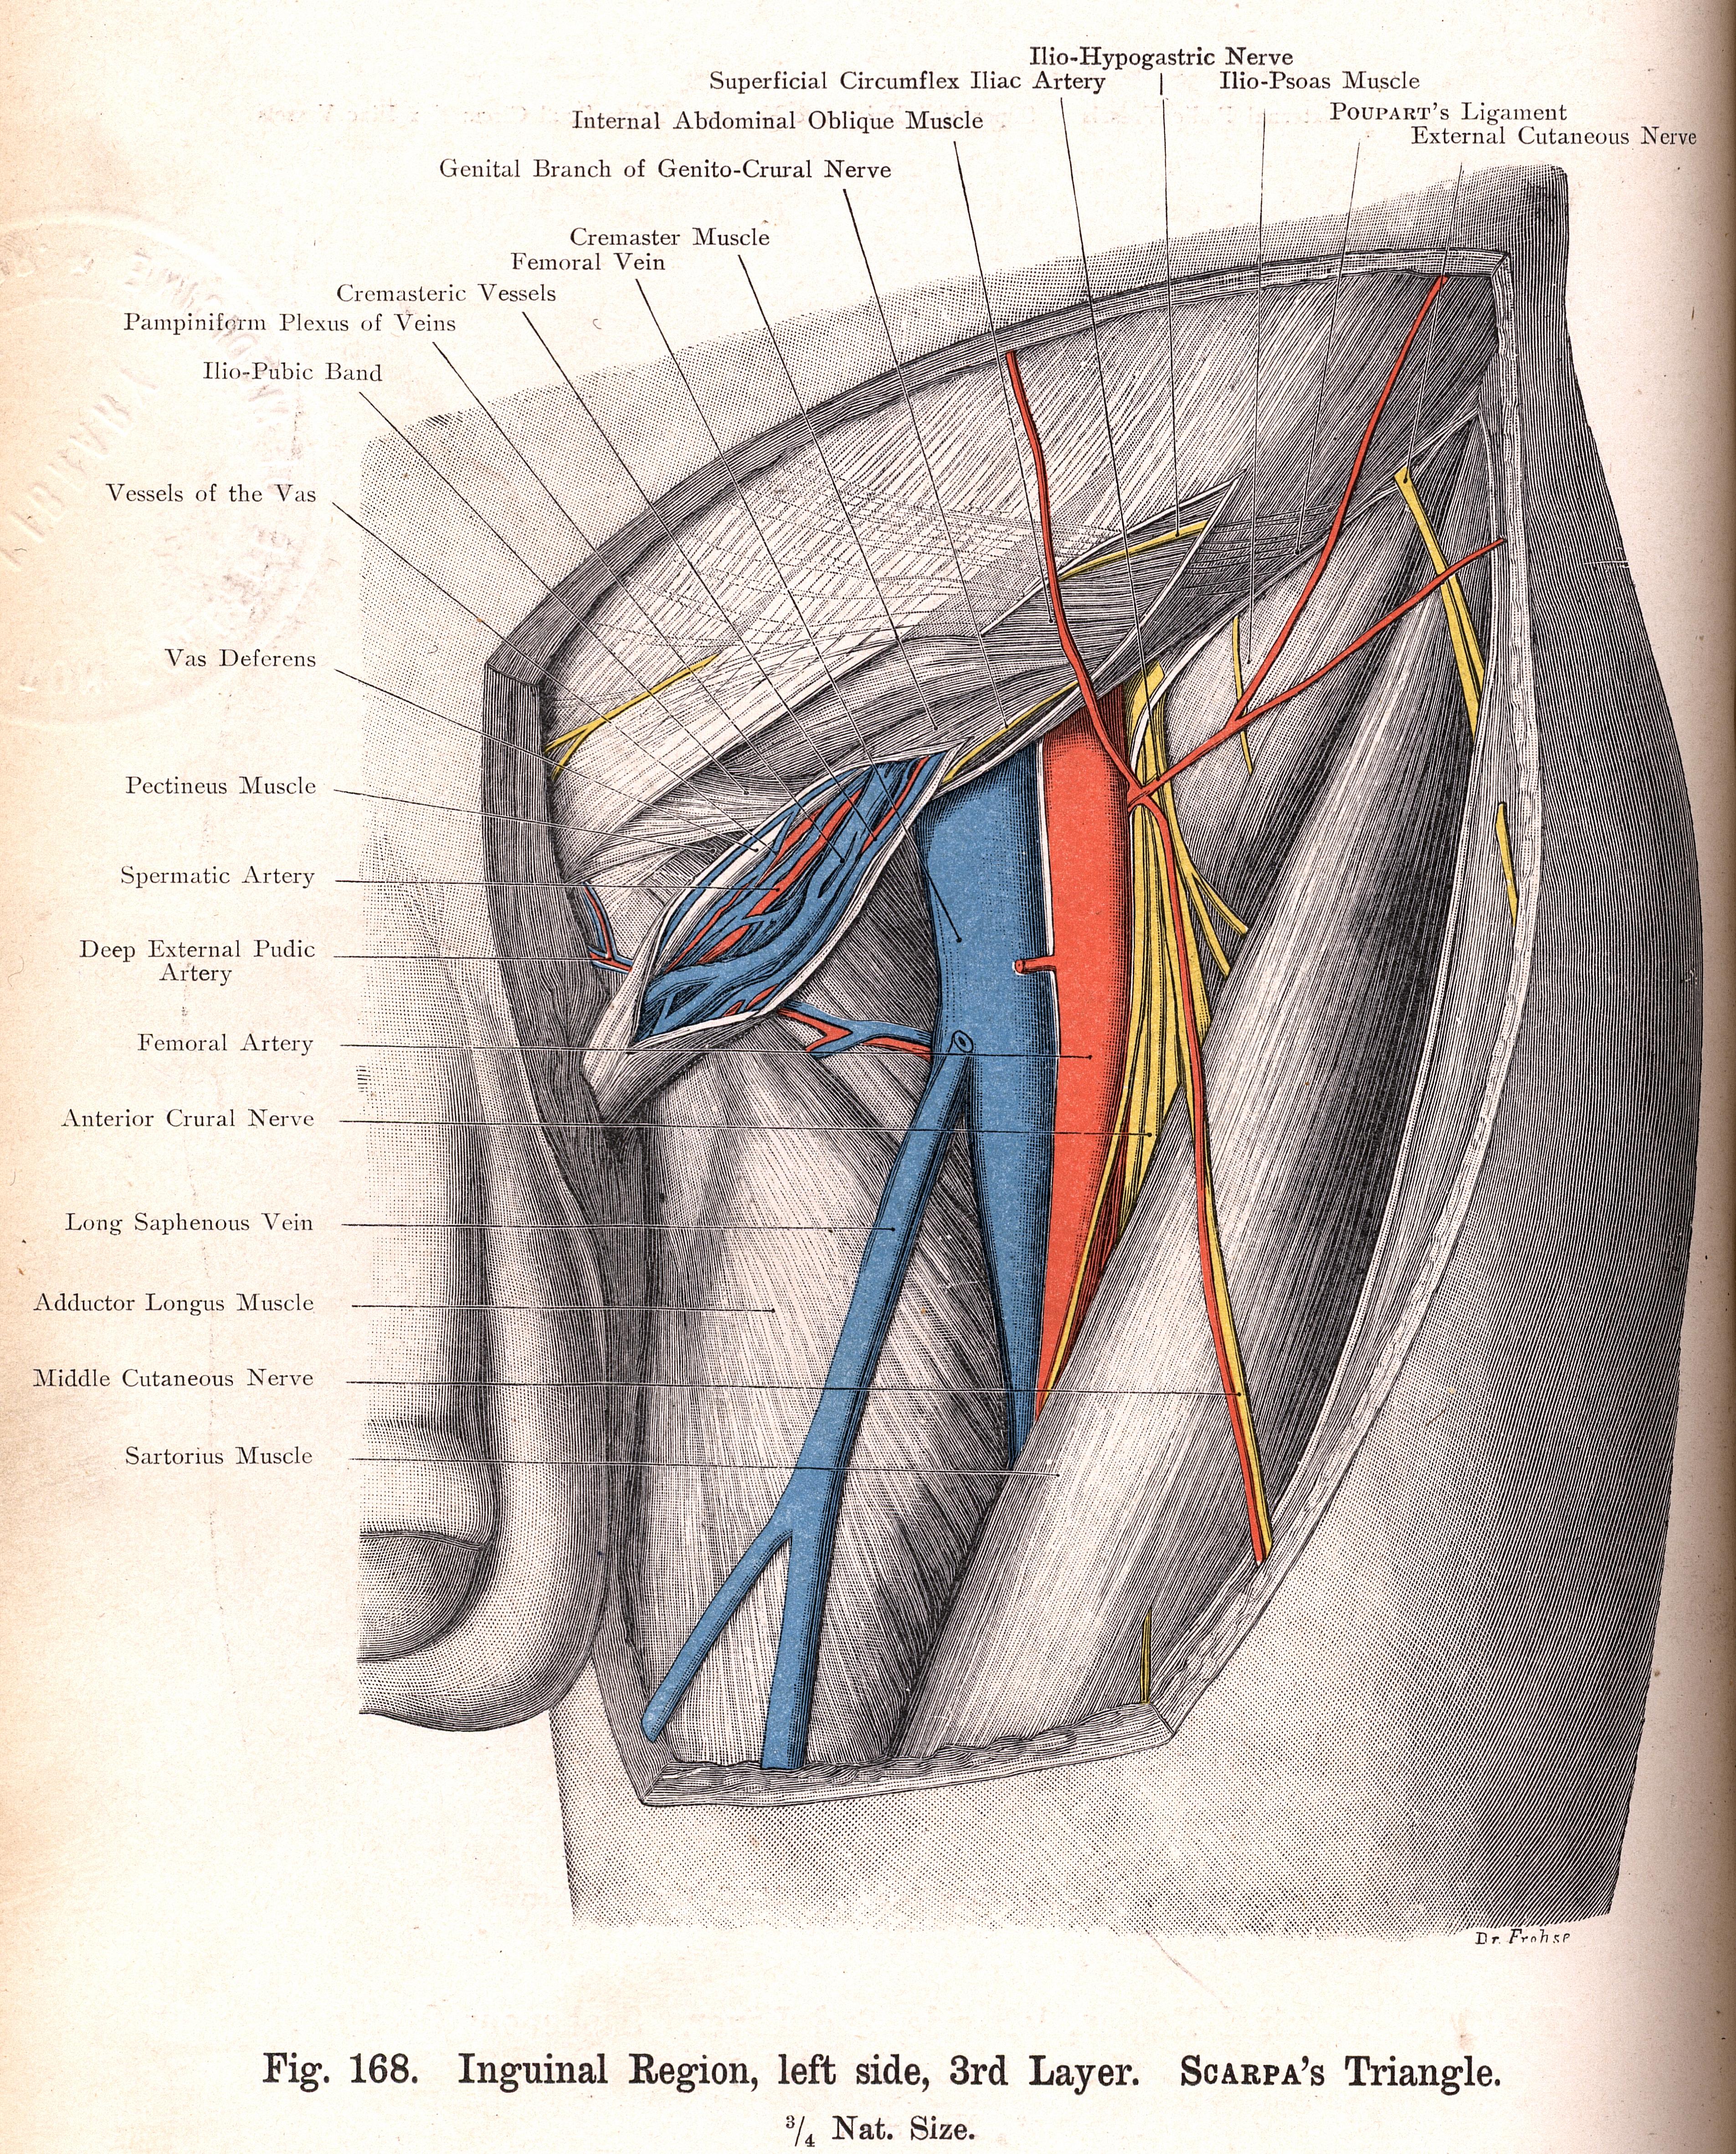 Треугольник Скарпа